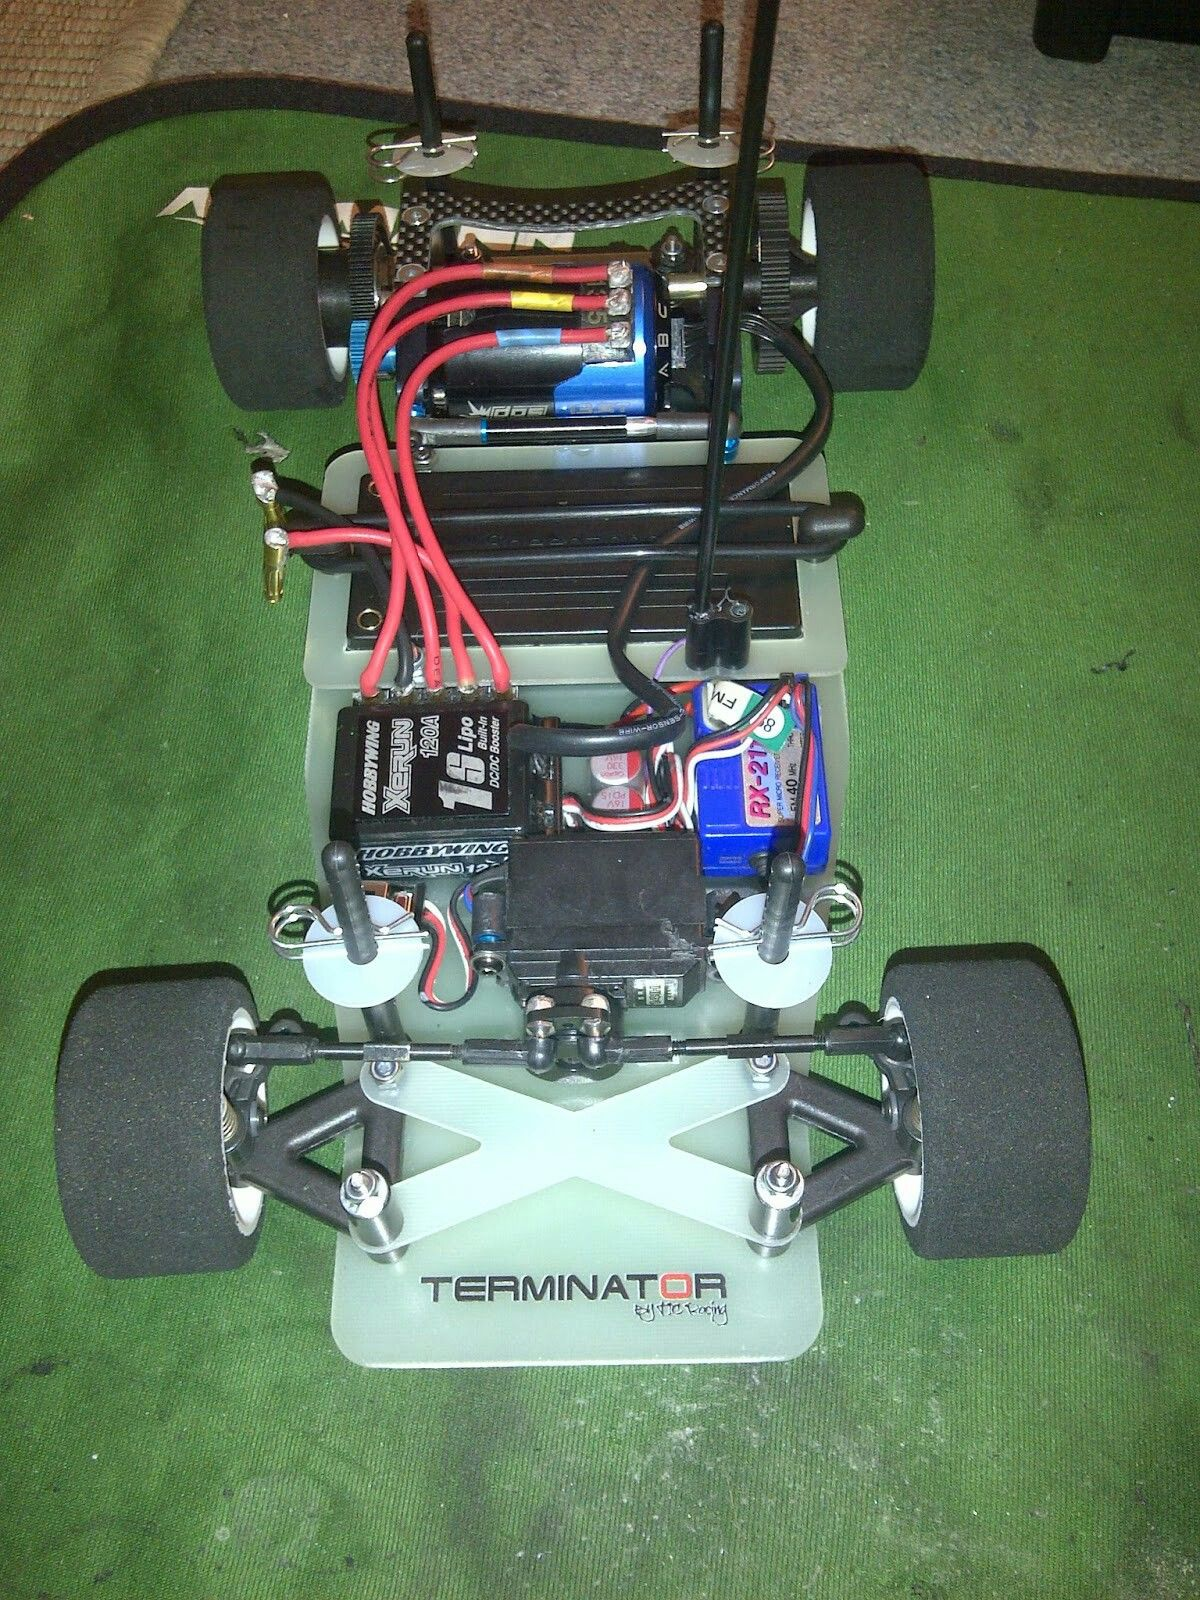 hight resolution of tic racing terminator gt12 rc drift tamiya radio control electric cars racing